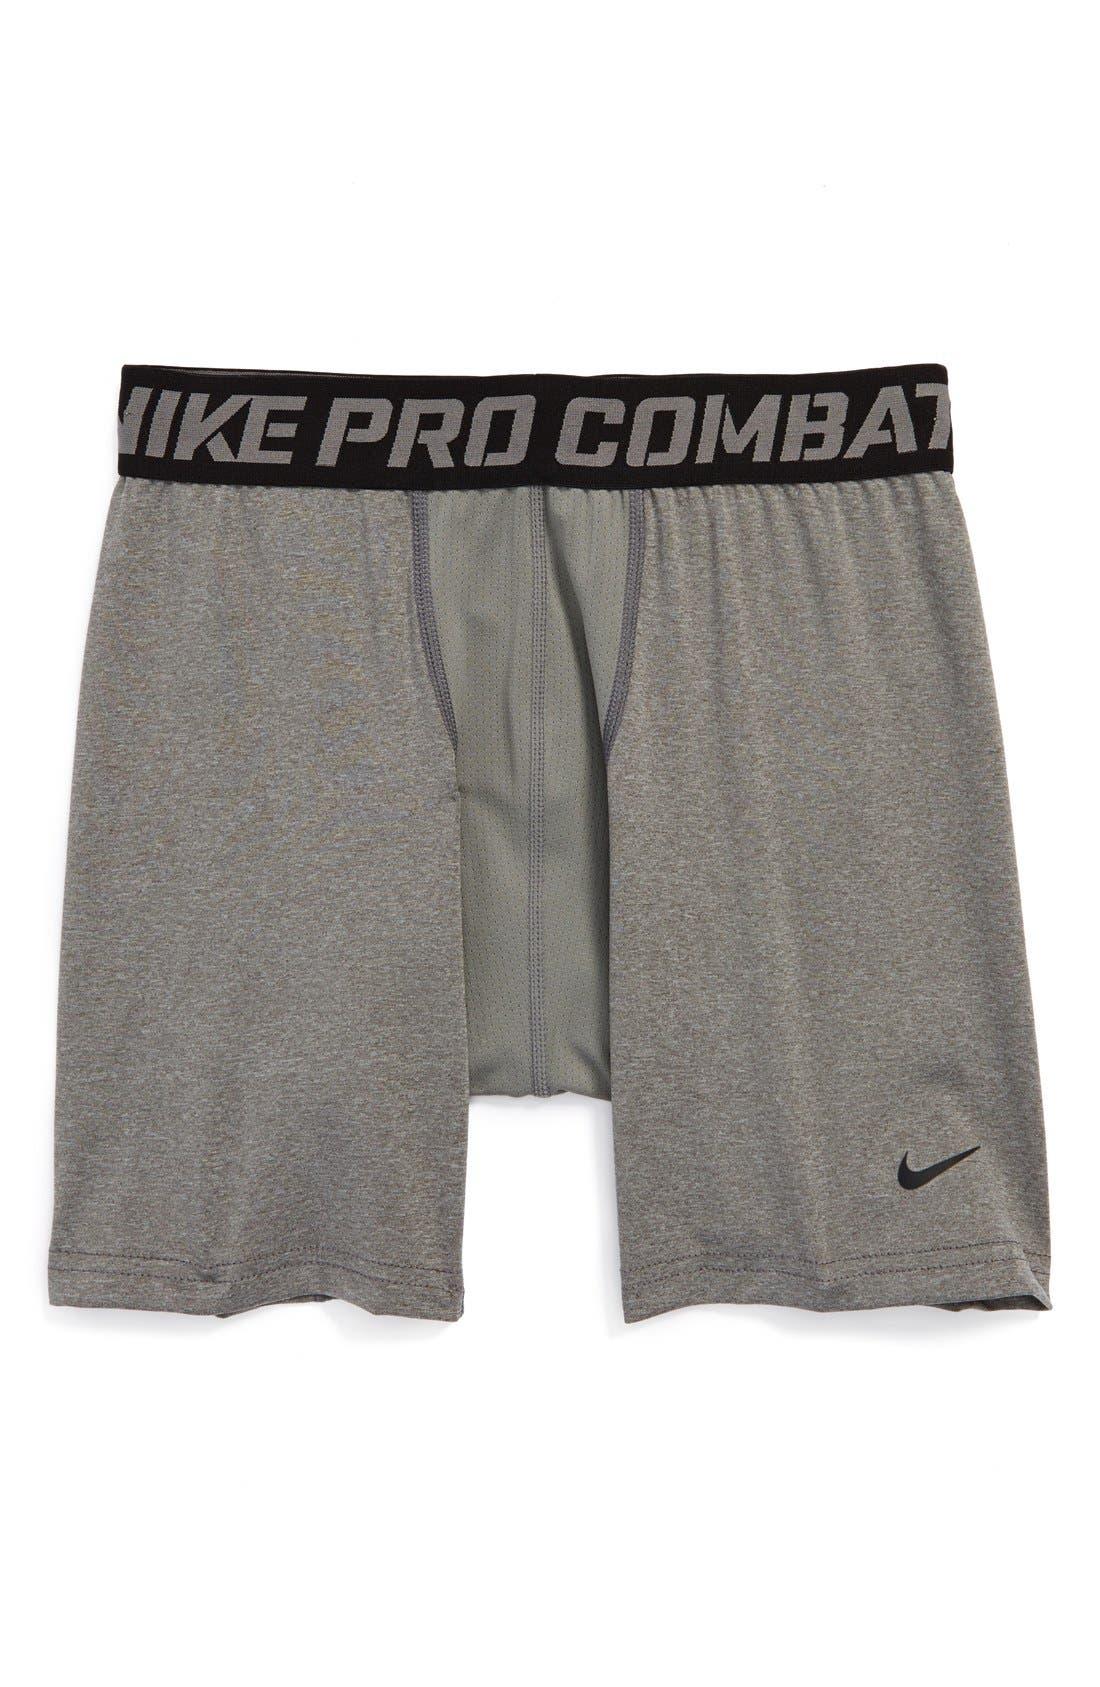 Alternate Image 1 Selected - Nike 'Pro Core' Compression Shorts (Big Boys)